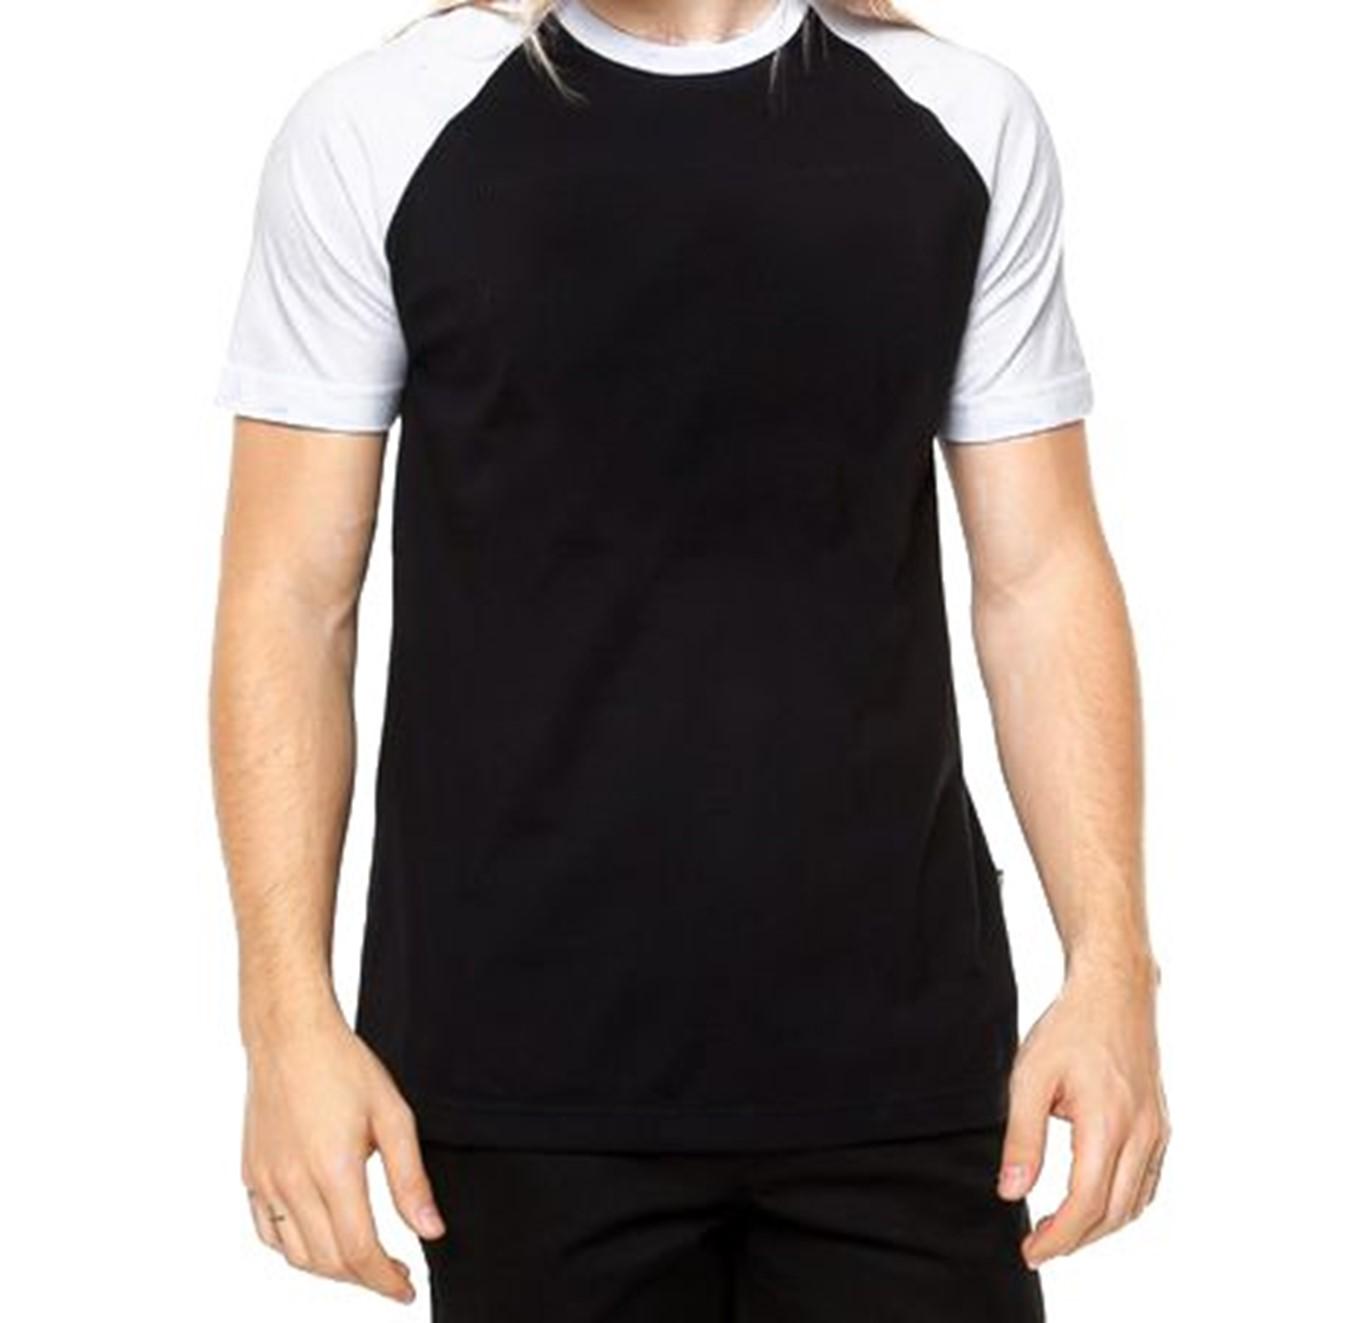 69687aa4bdb Camisa Raglan PRETA com manga BRANCA (opção manga longa ou curta ...